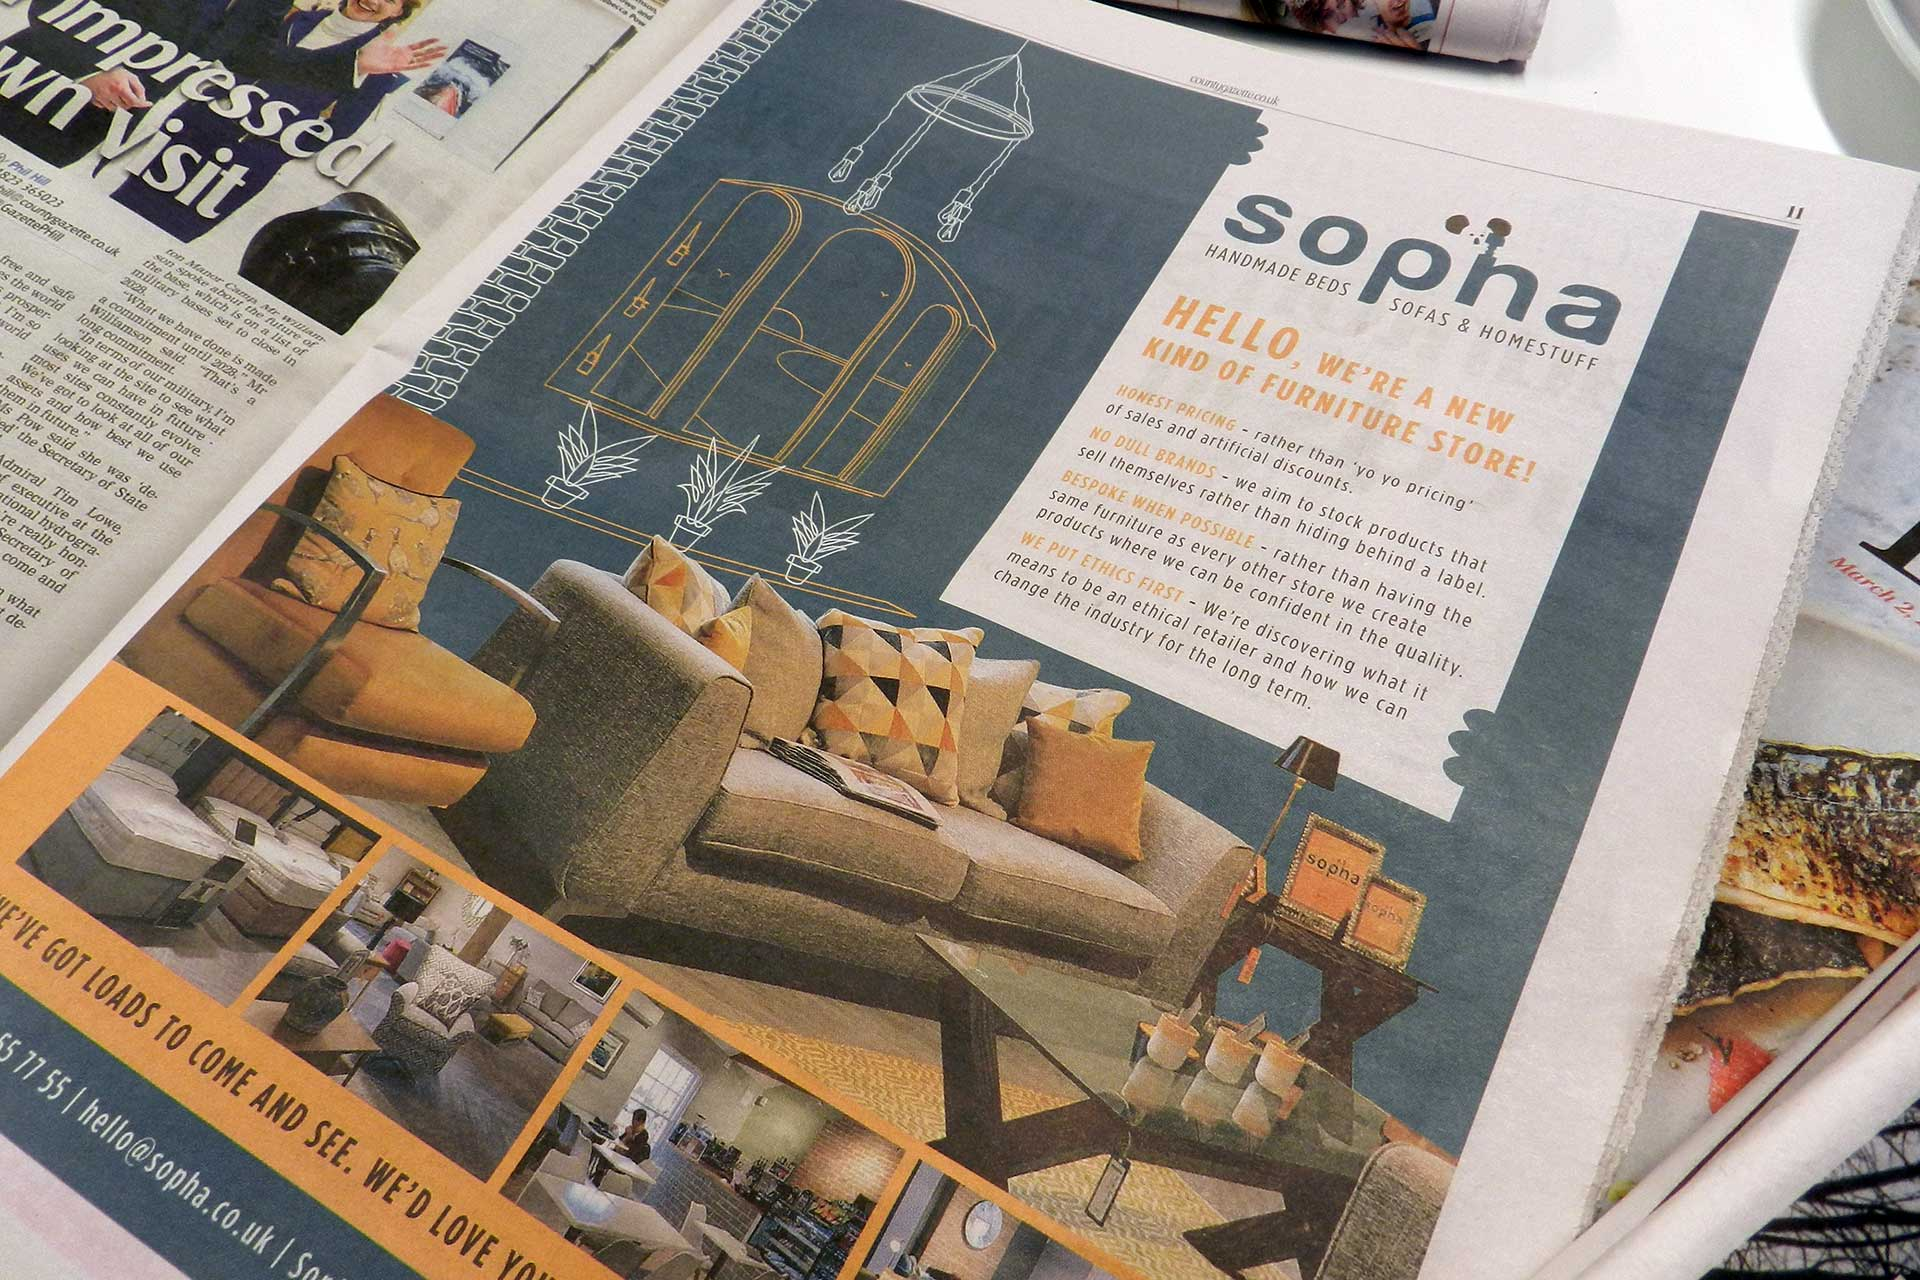 Sopha-furniture-advert-illustration-Highbridge The Importance of Branding & Graphic Design in a Business